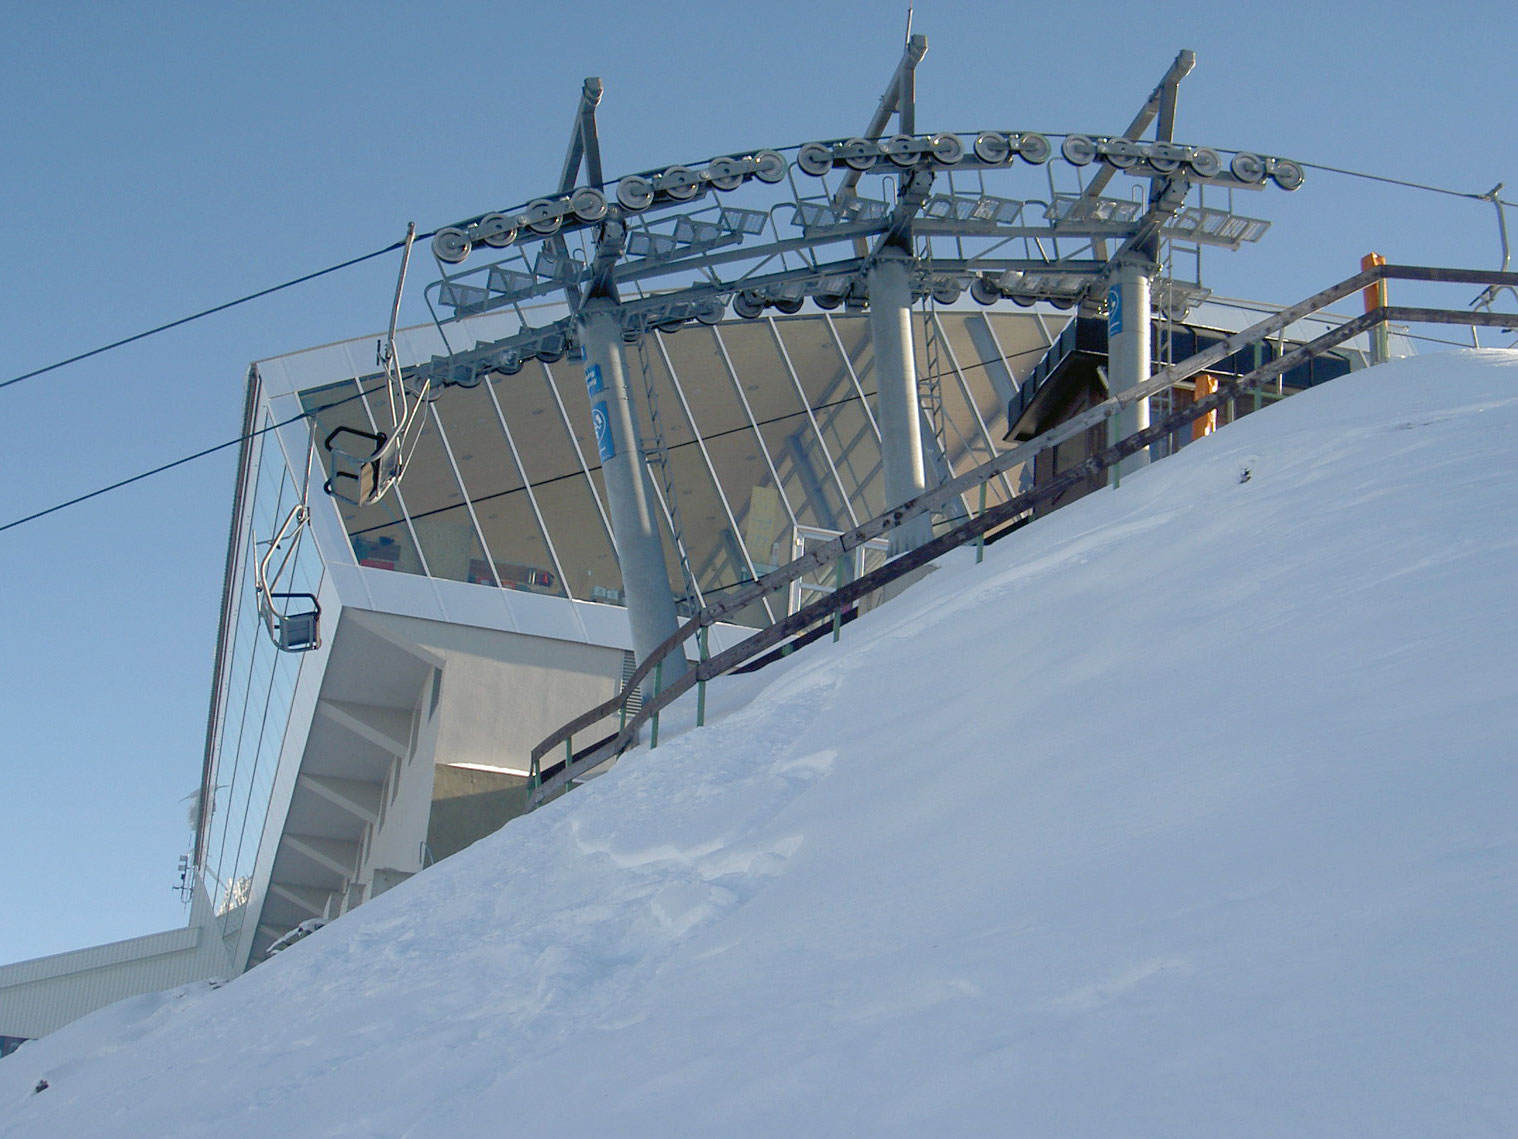 Ski Restaurant Hoadl